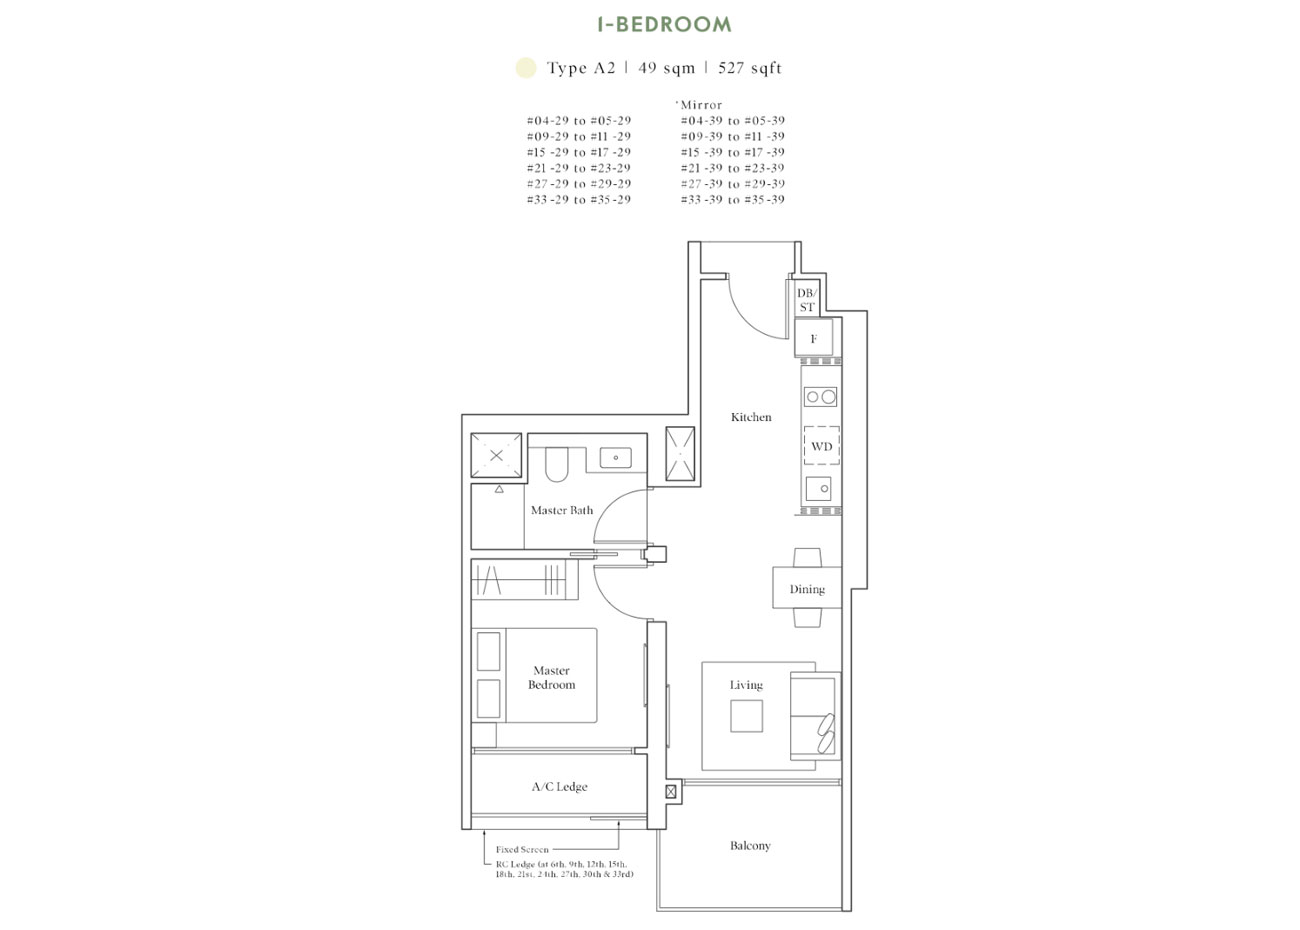 Horizon Collection - 1 Bedroom, A2